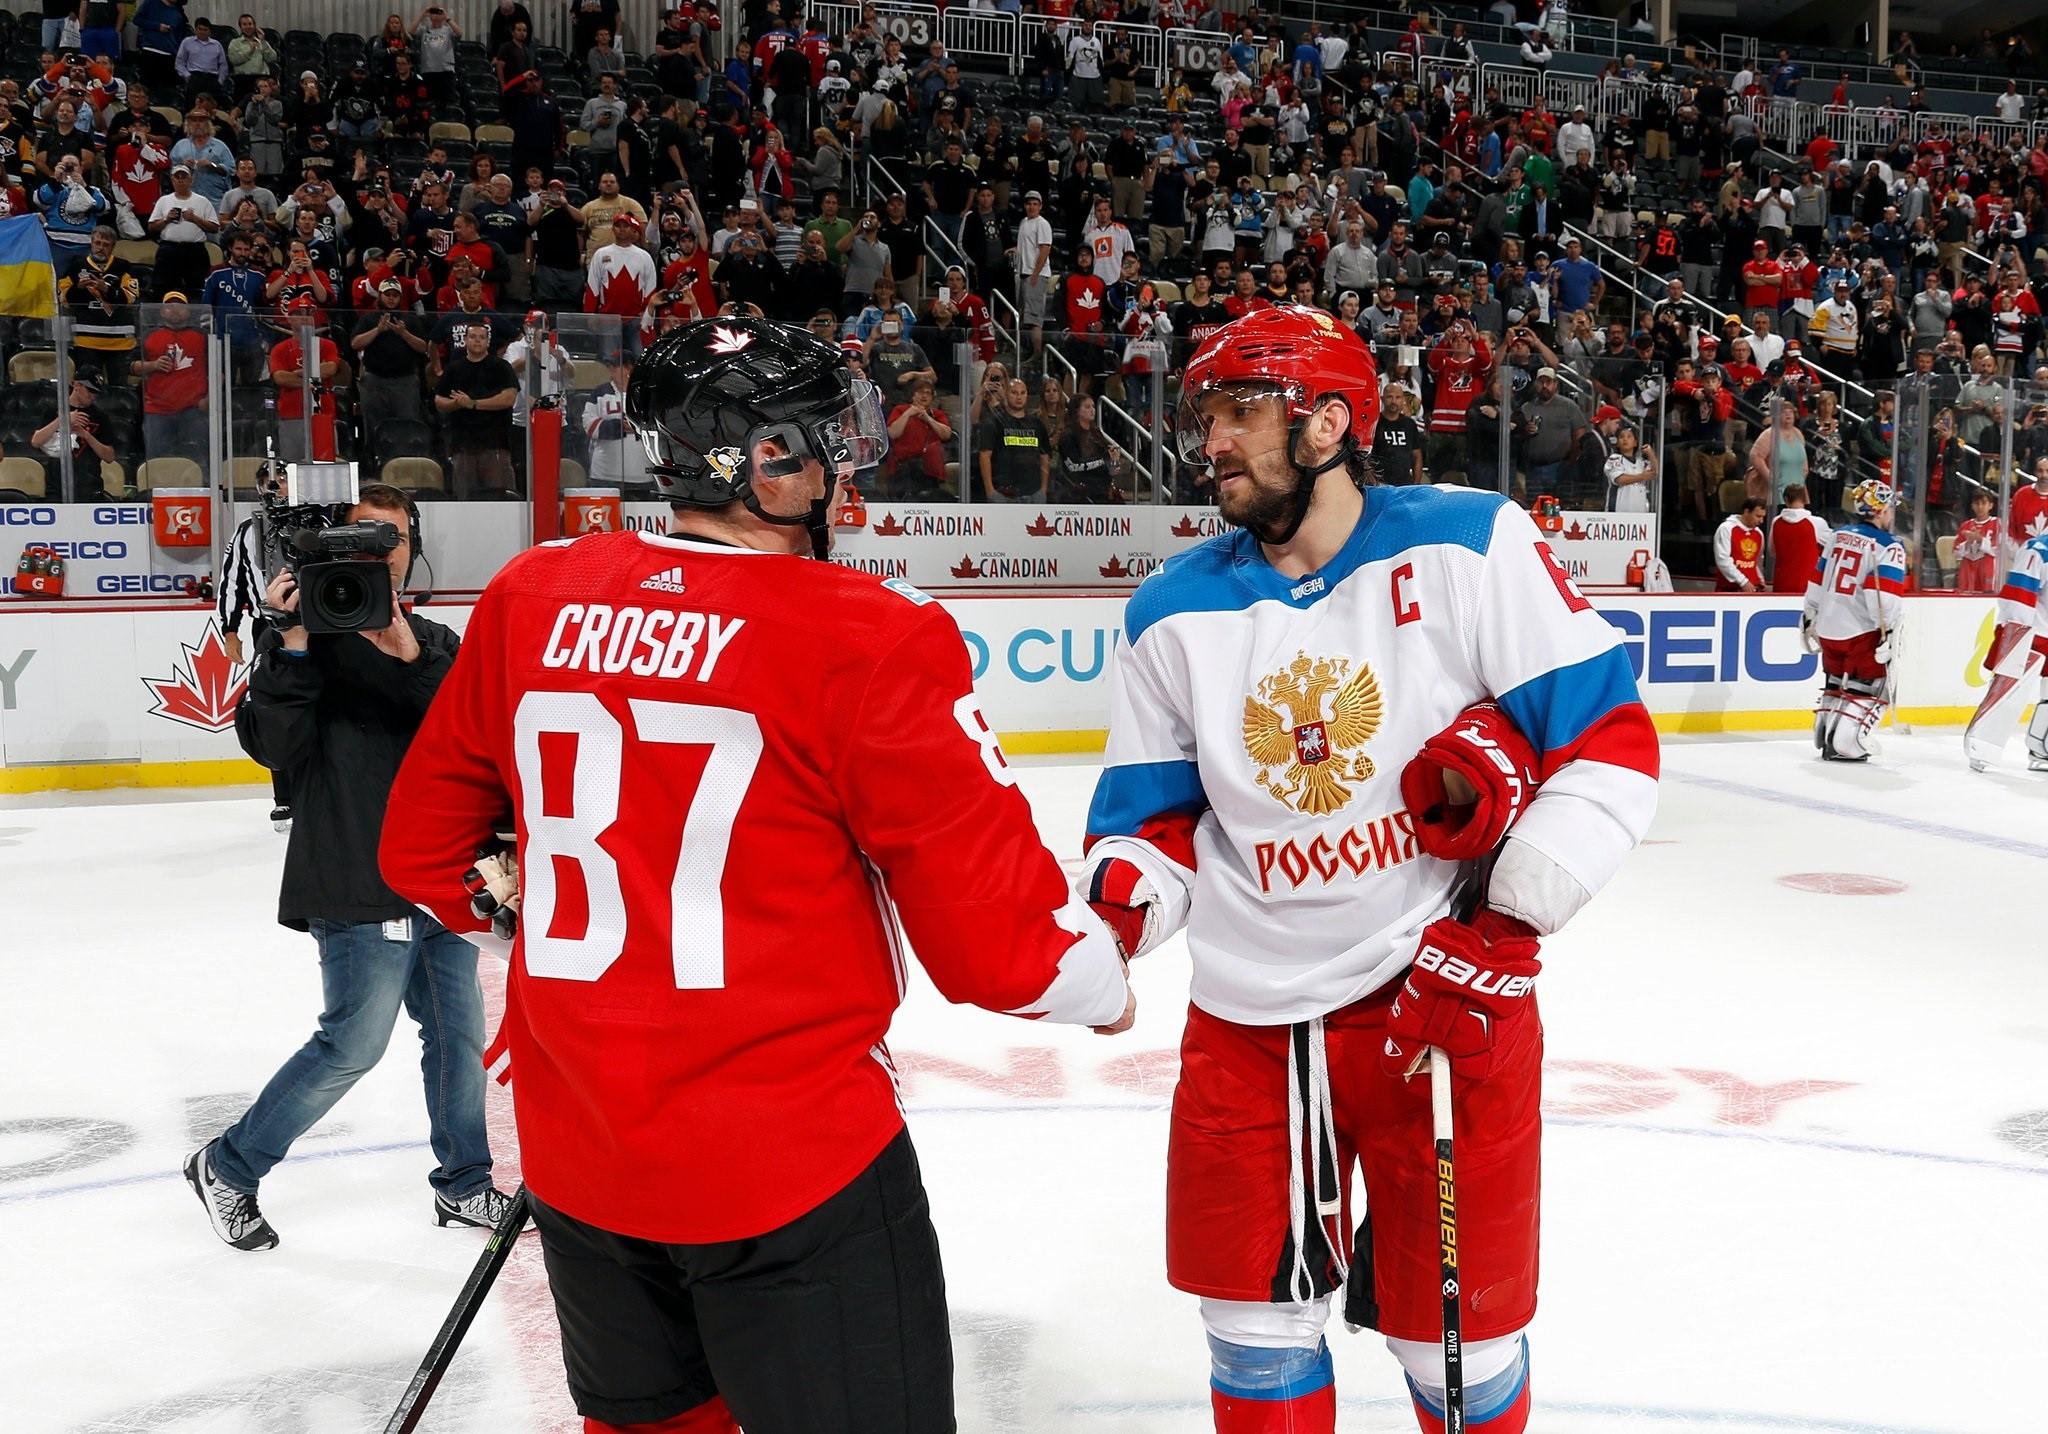 Сидни Кросби и Александр Овечкин перед матчем Канада – Россия – twitter.com/NHL